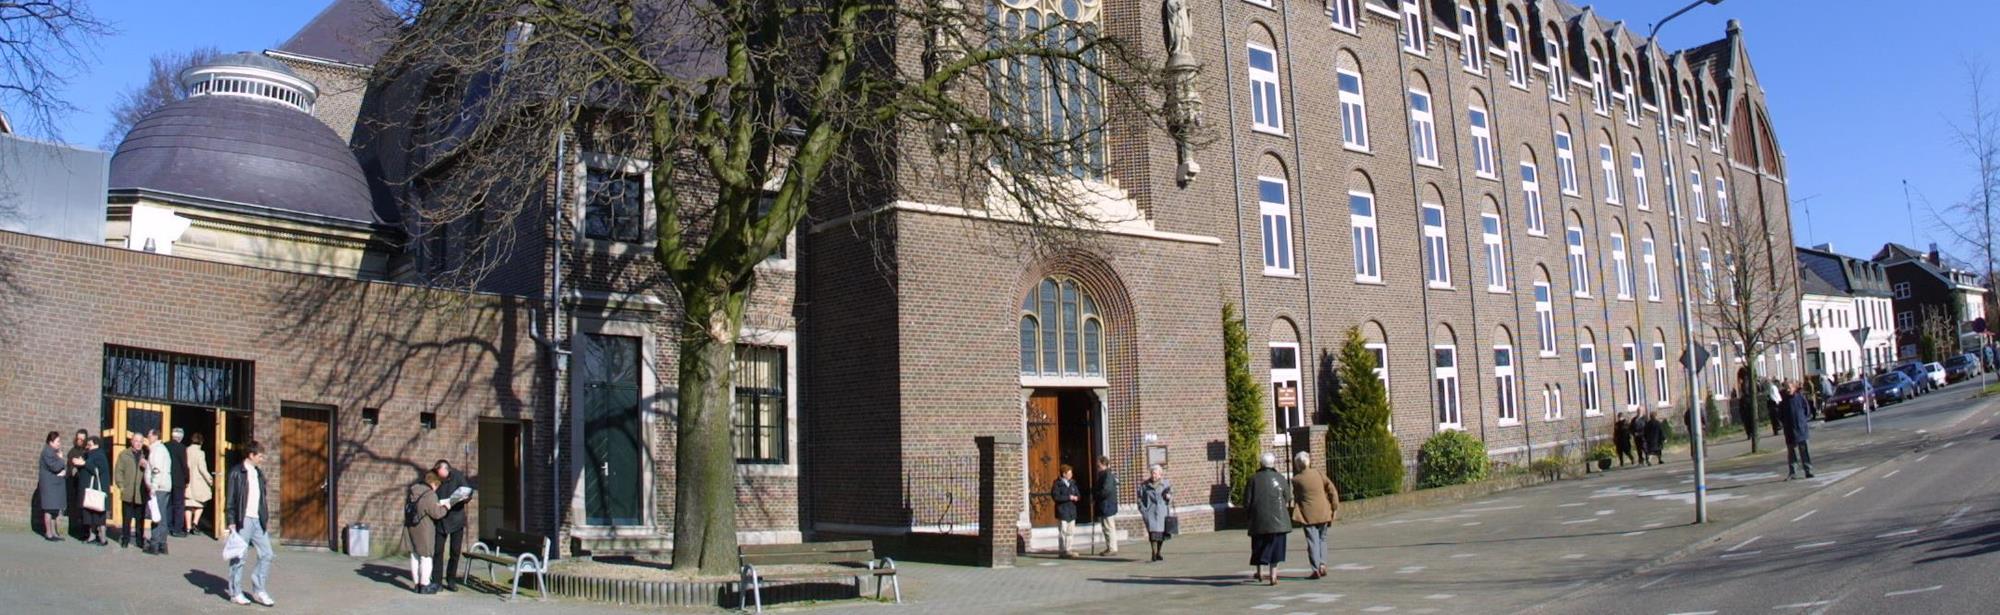 Redemptoristen Klooster Wittem